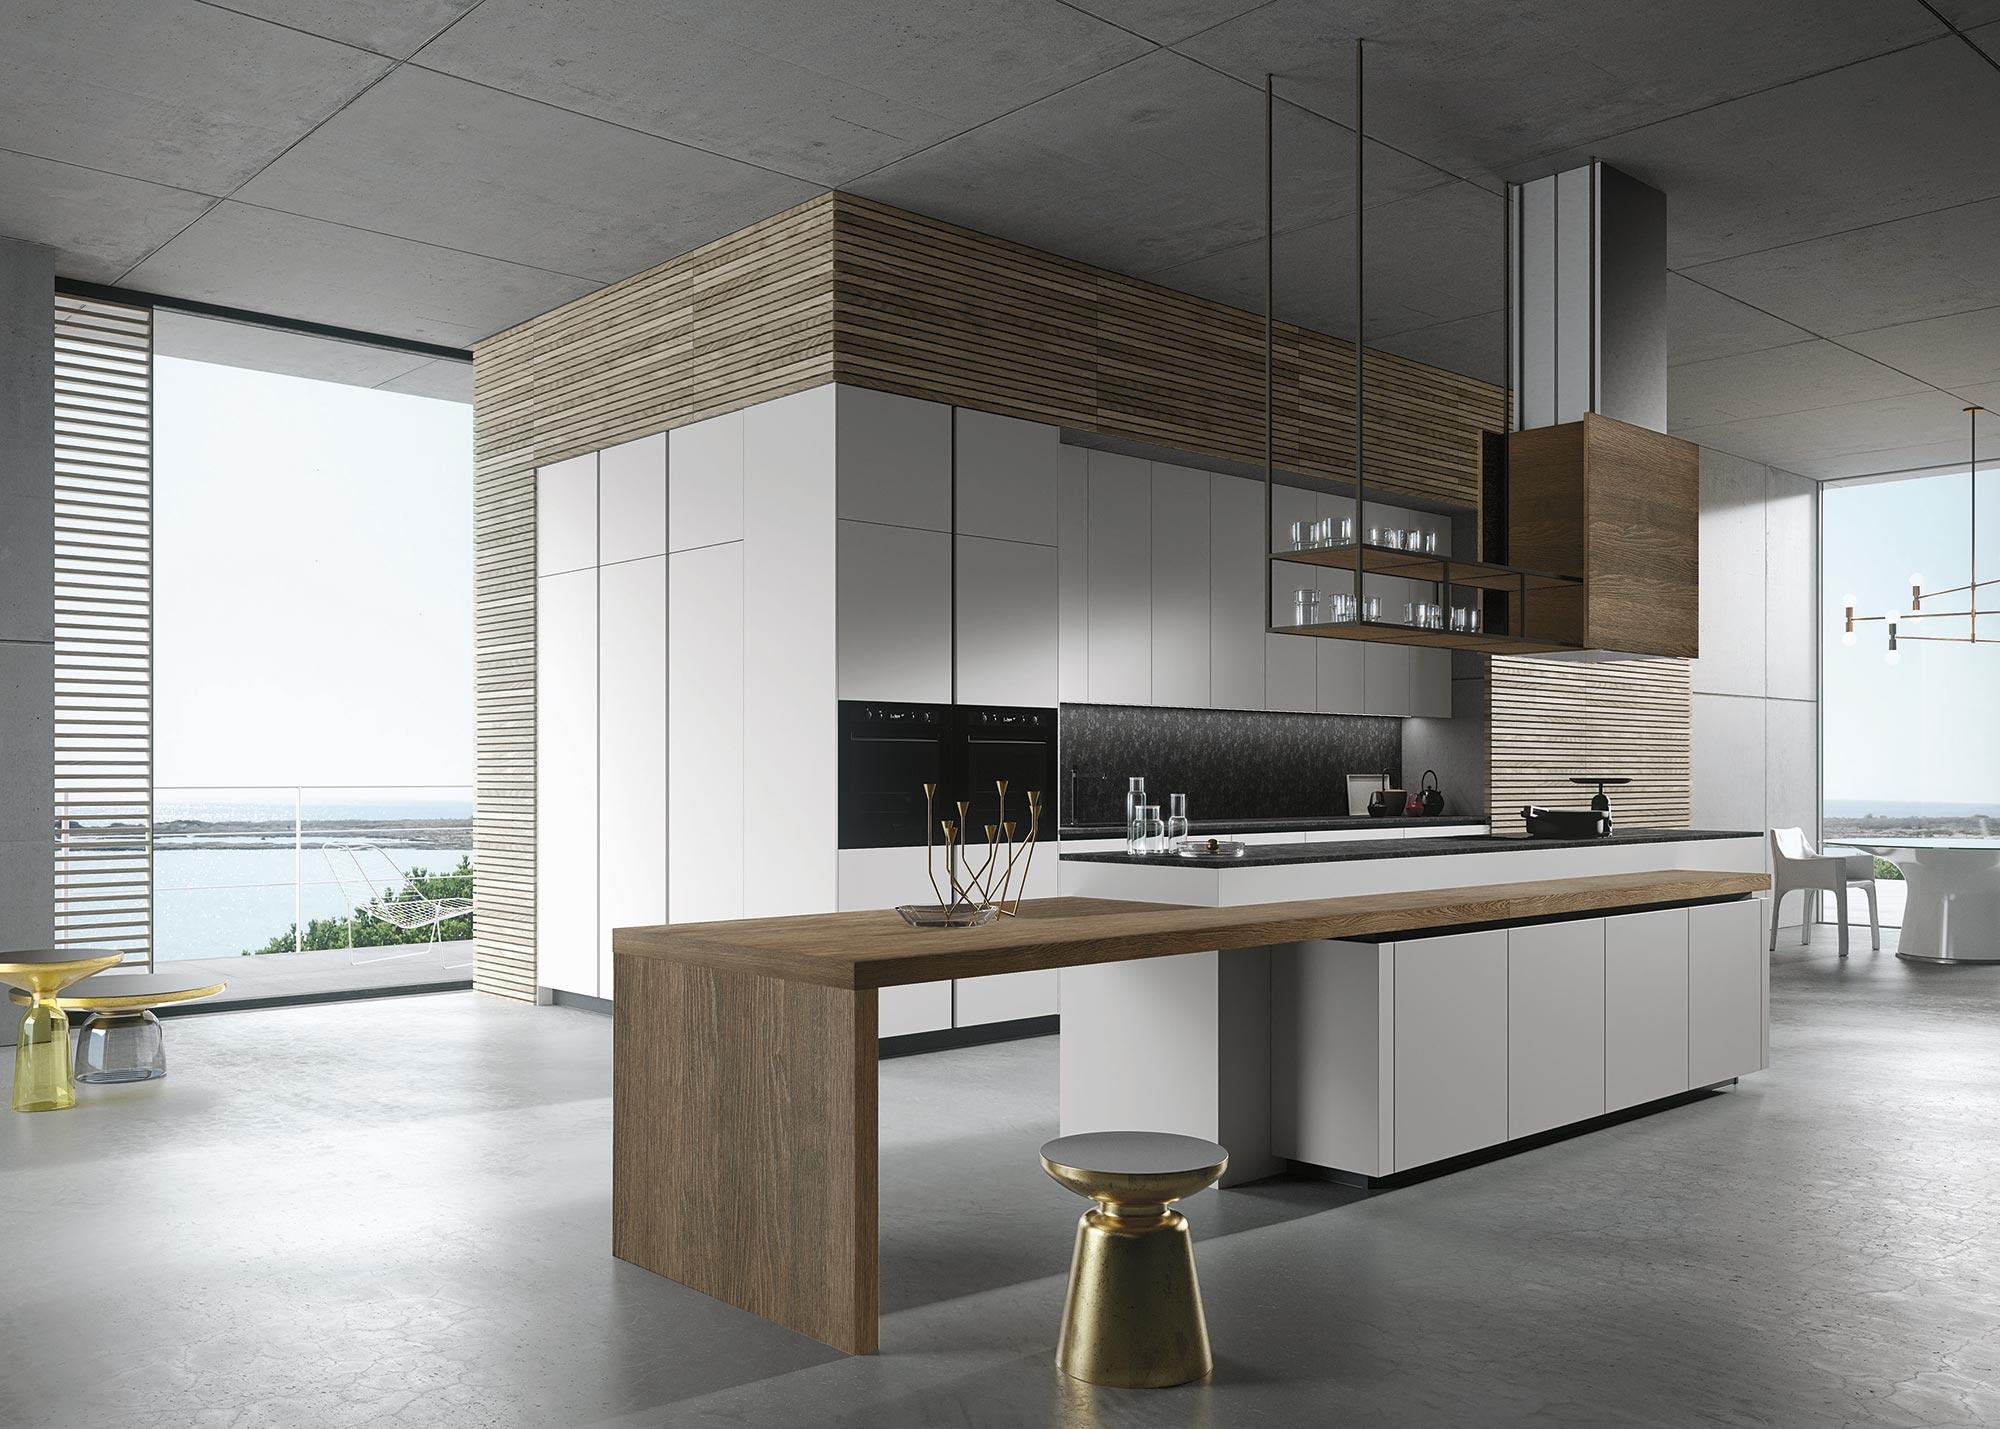 Cucine moderne eleganza sartoriale e contaminazione - Cucine moderne gialle ...